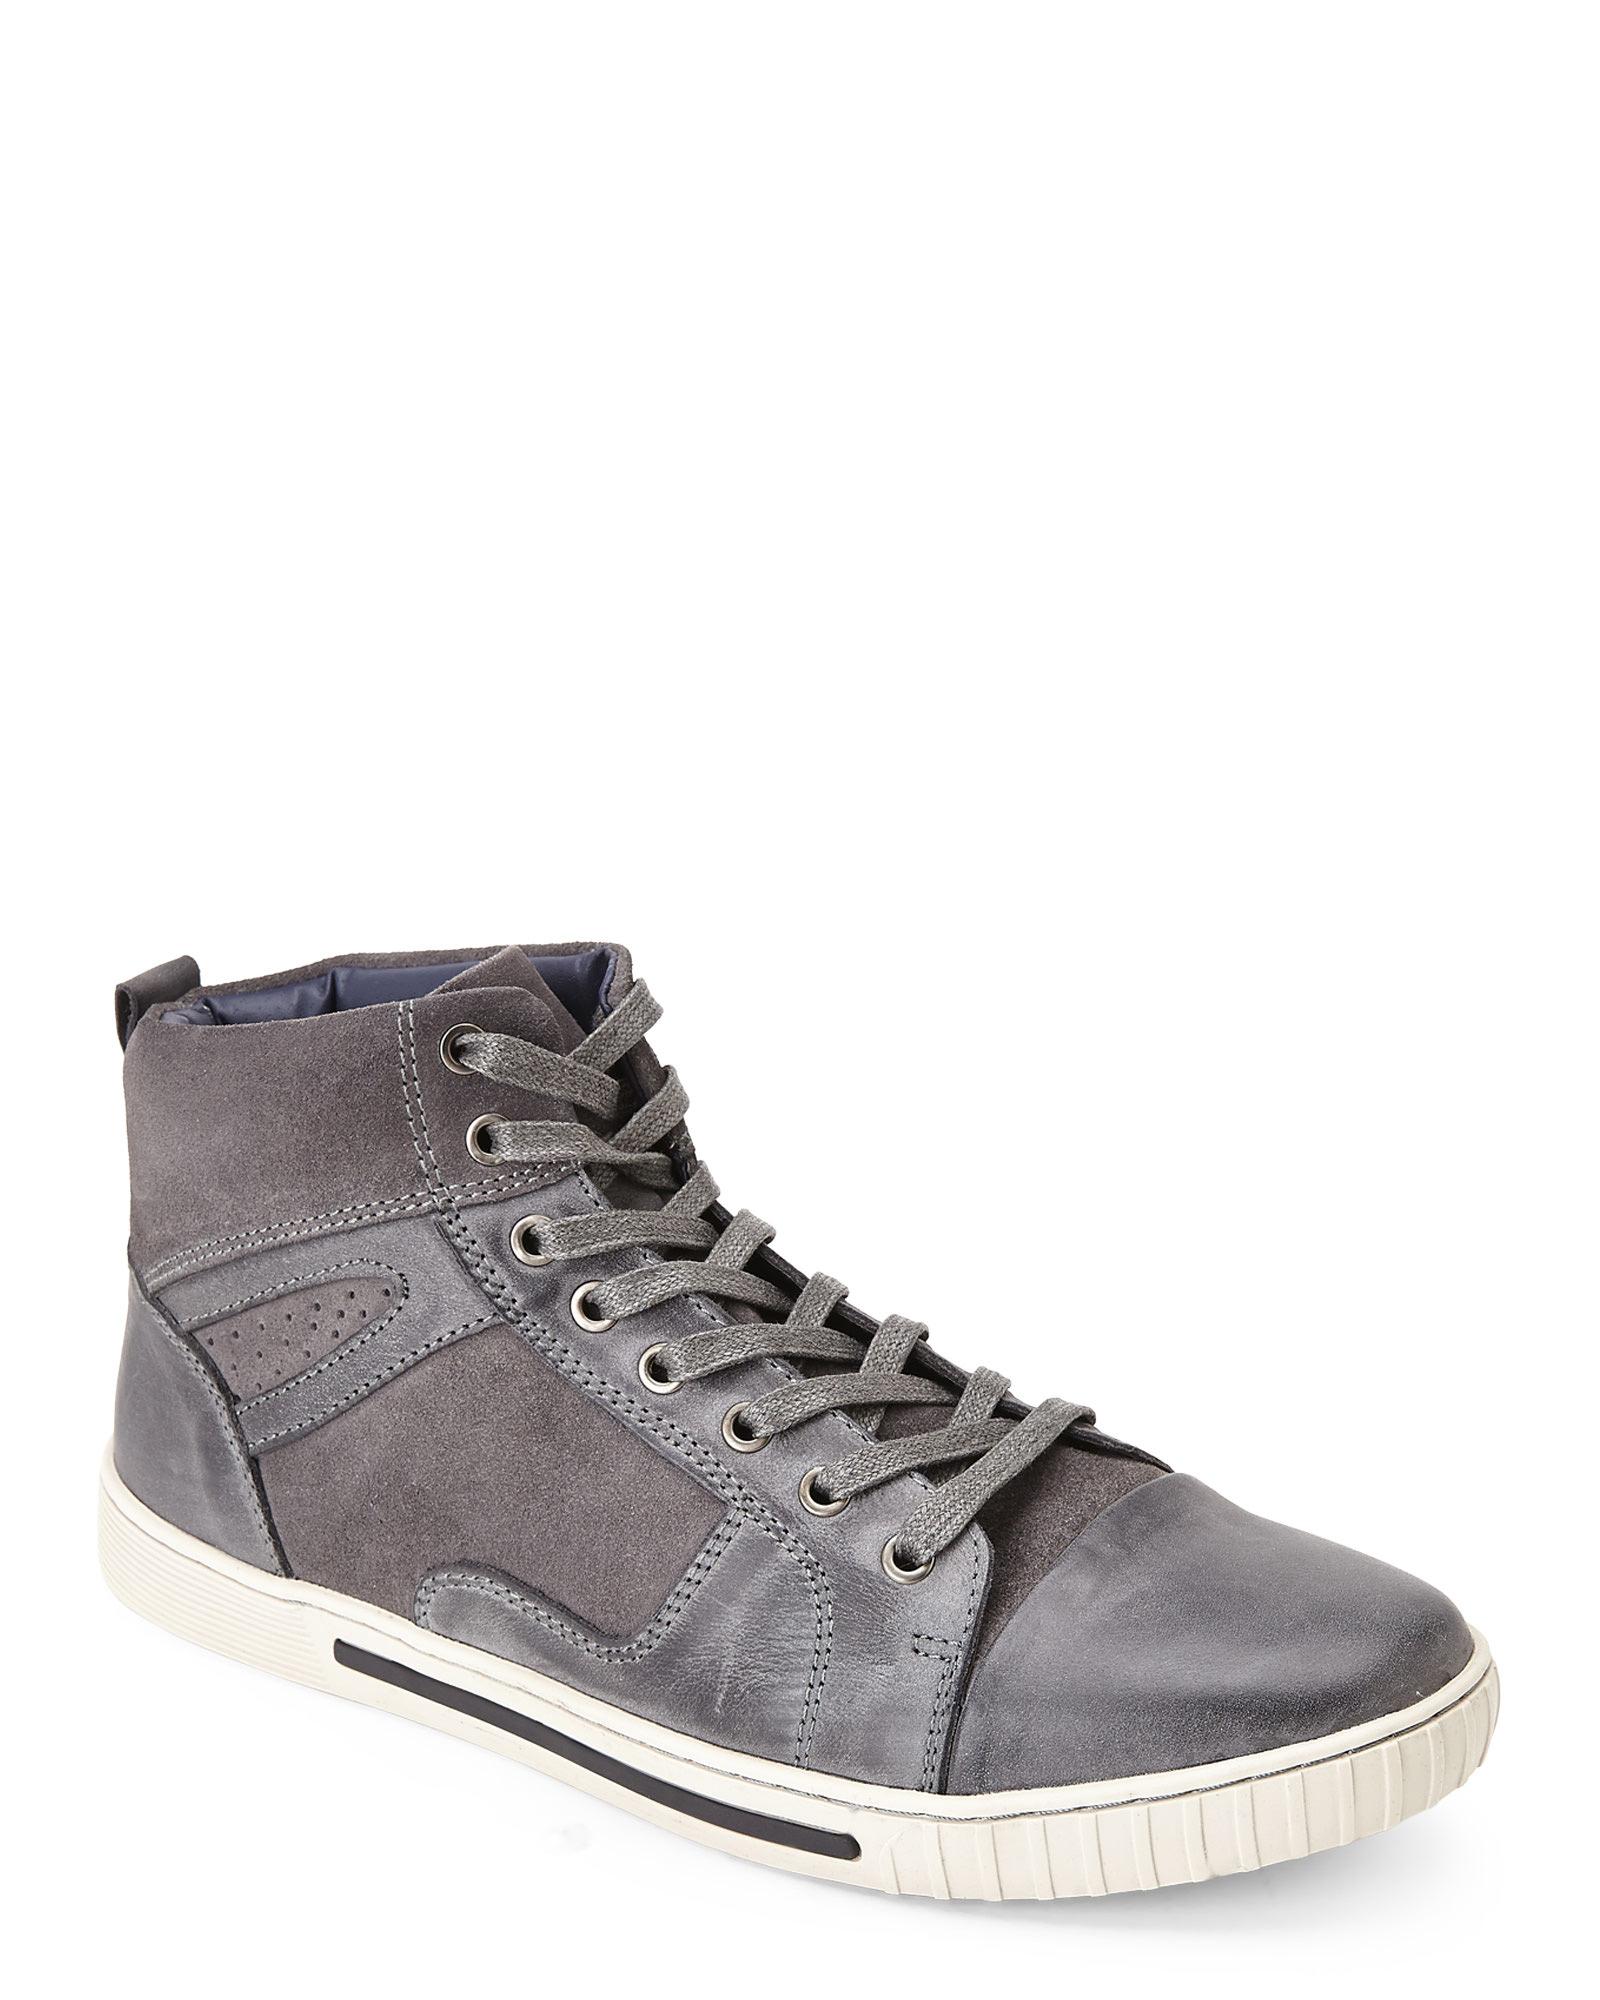 Mens Steve Madden Men's Peerow Fashion Sneaker For Sale Size 42